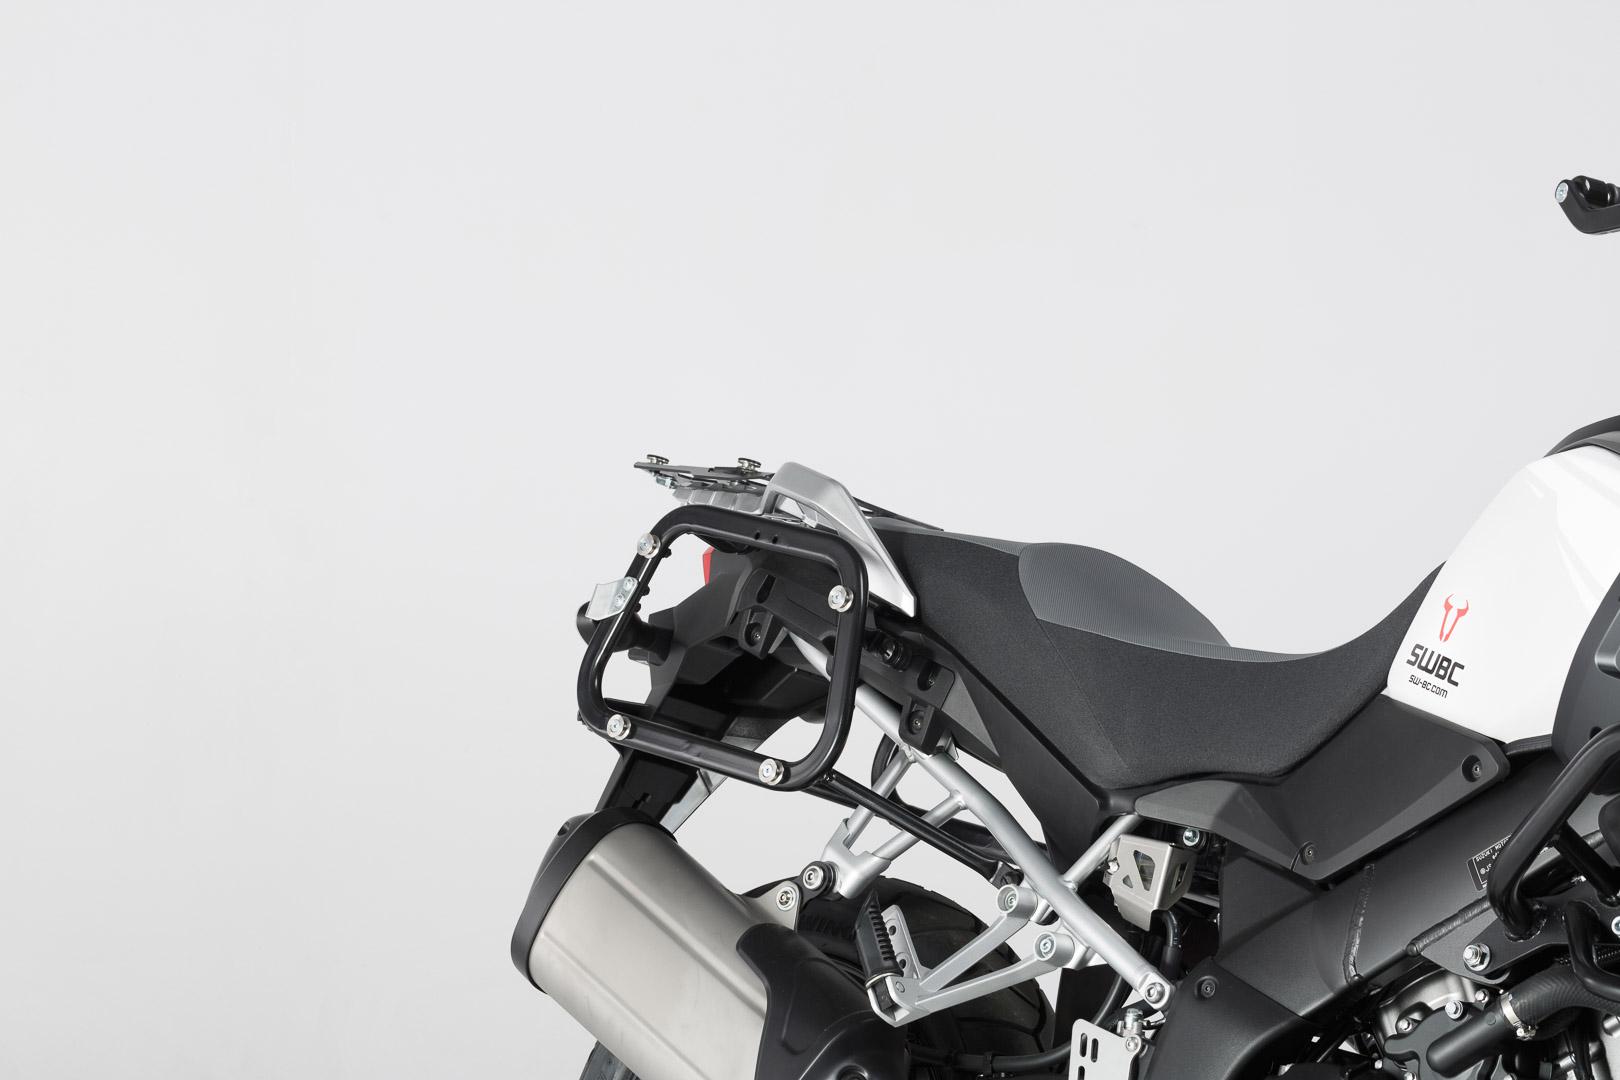 Quick-Lock EVO sivutelinesarja, Suzuki DL1000 V-Strom 14-